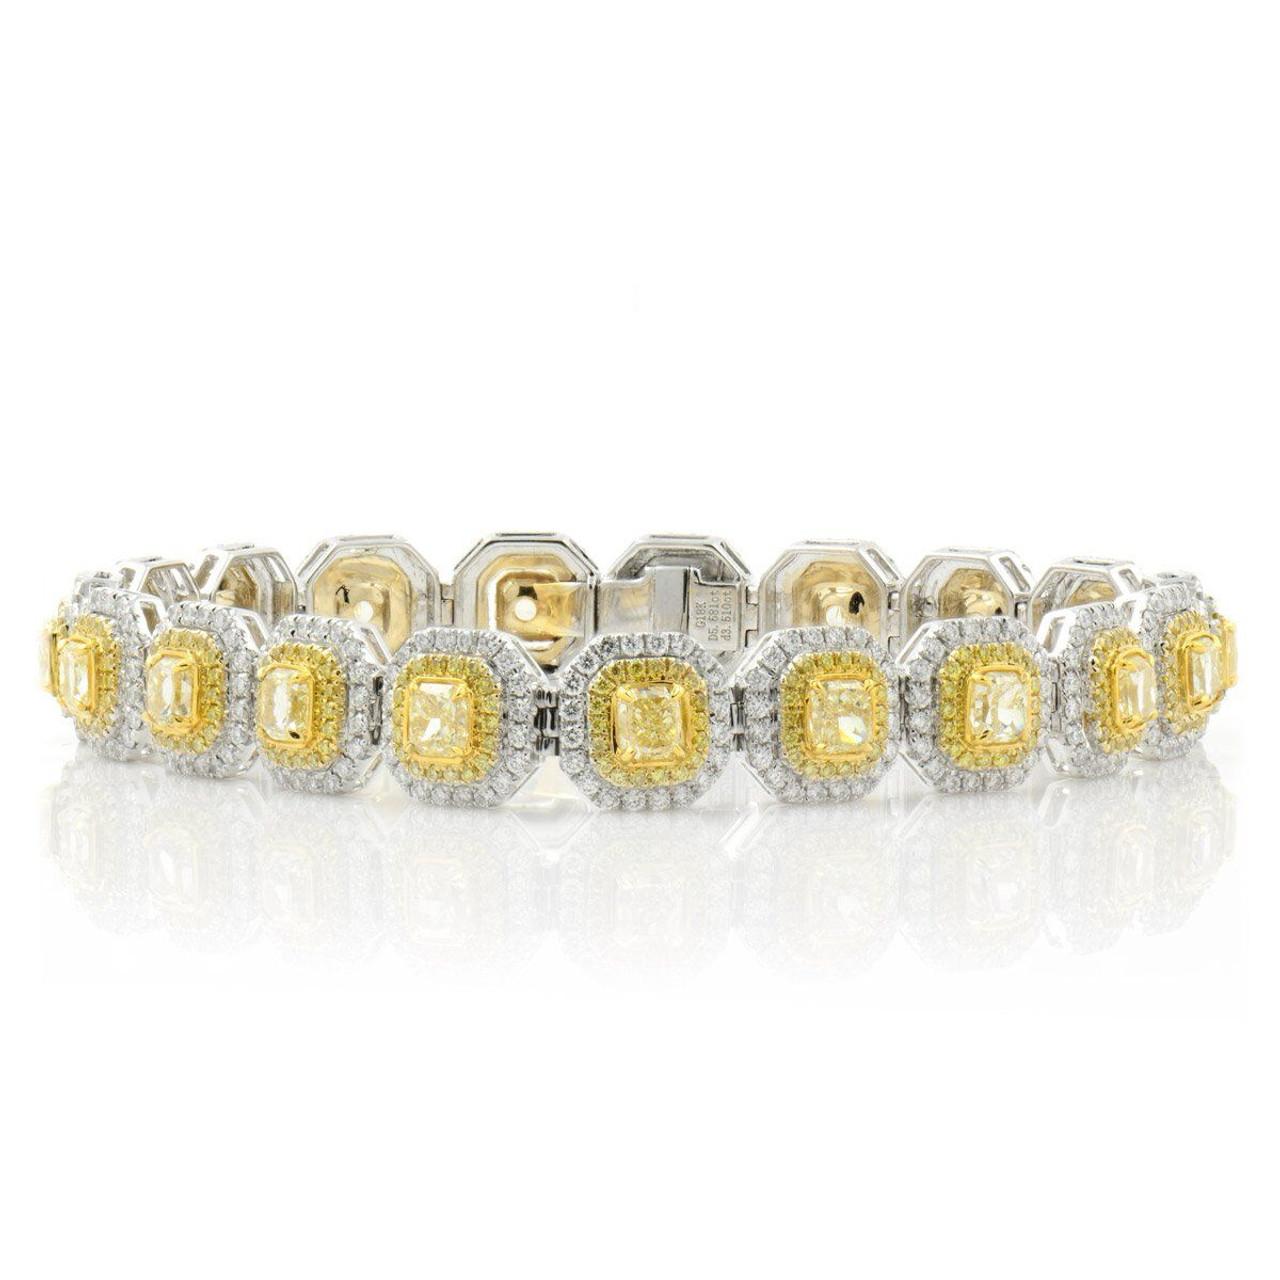 18kt White And Yellow Gold Double Halo Radiant Diamond Bracelet